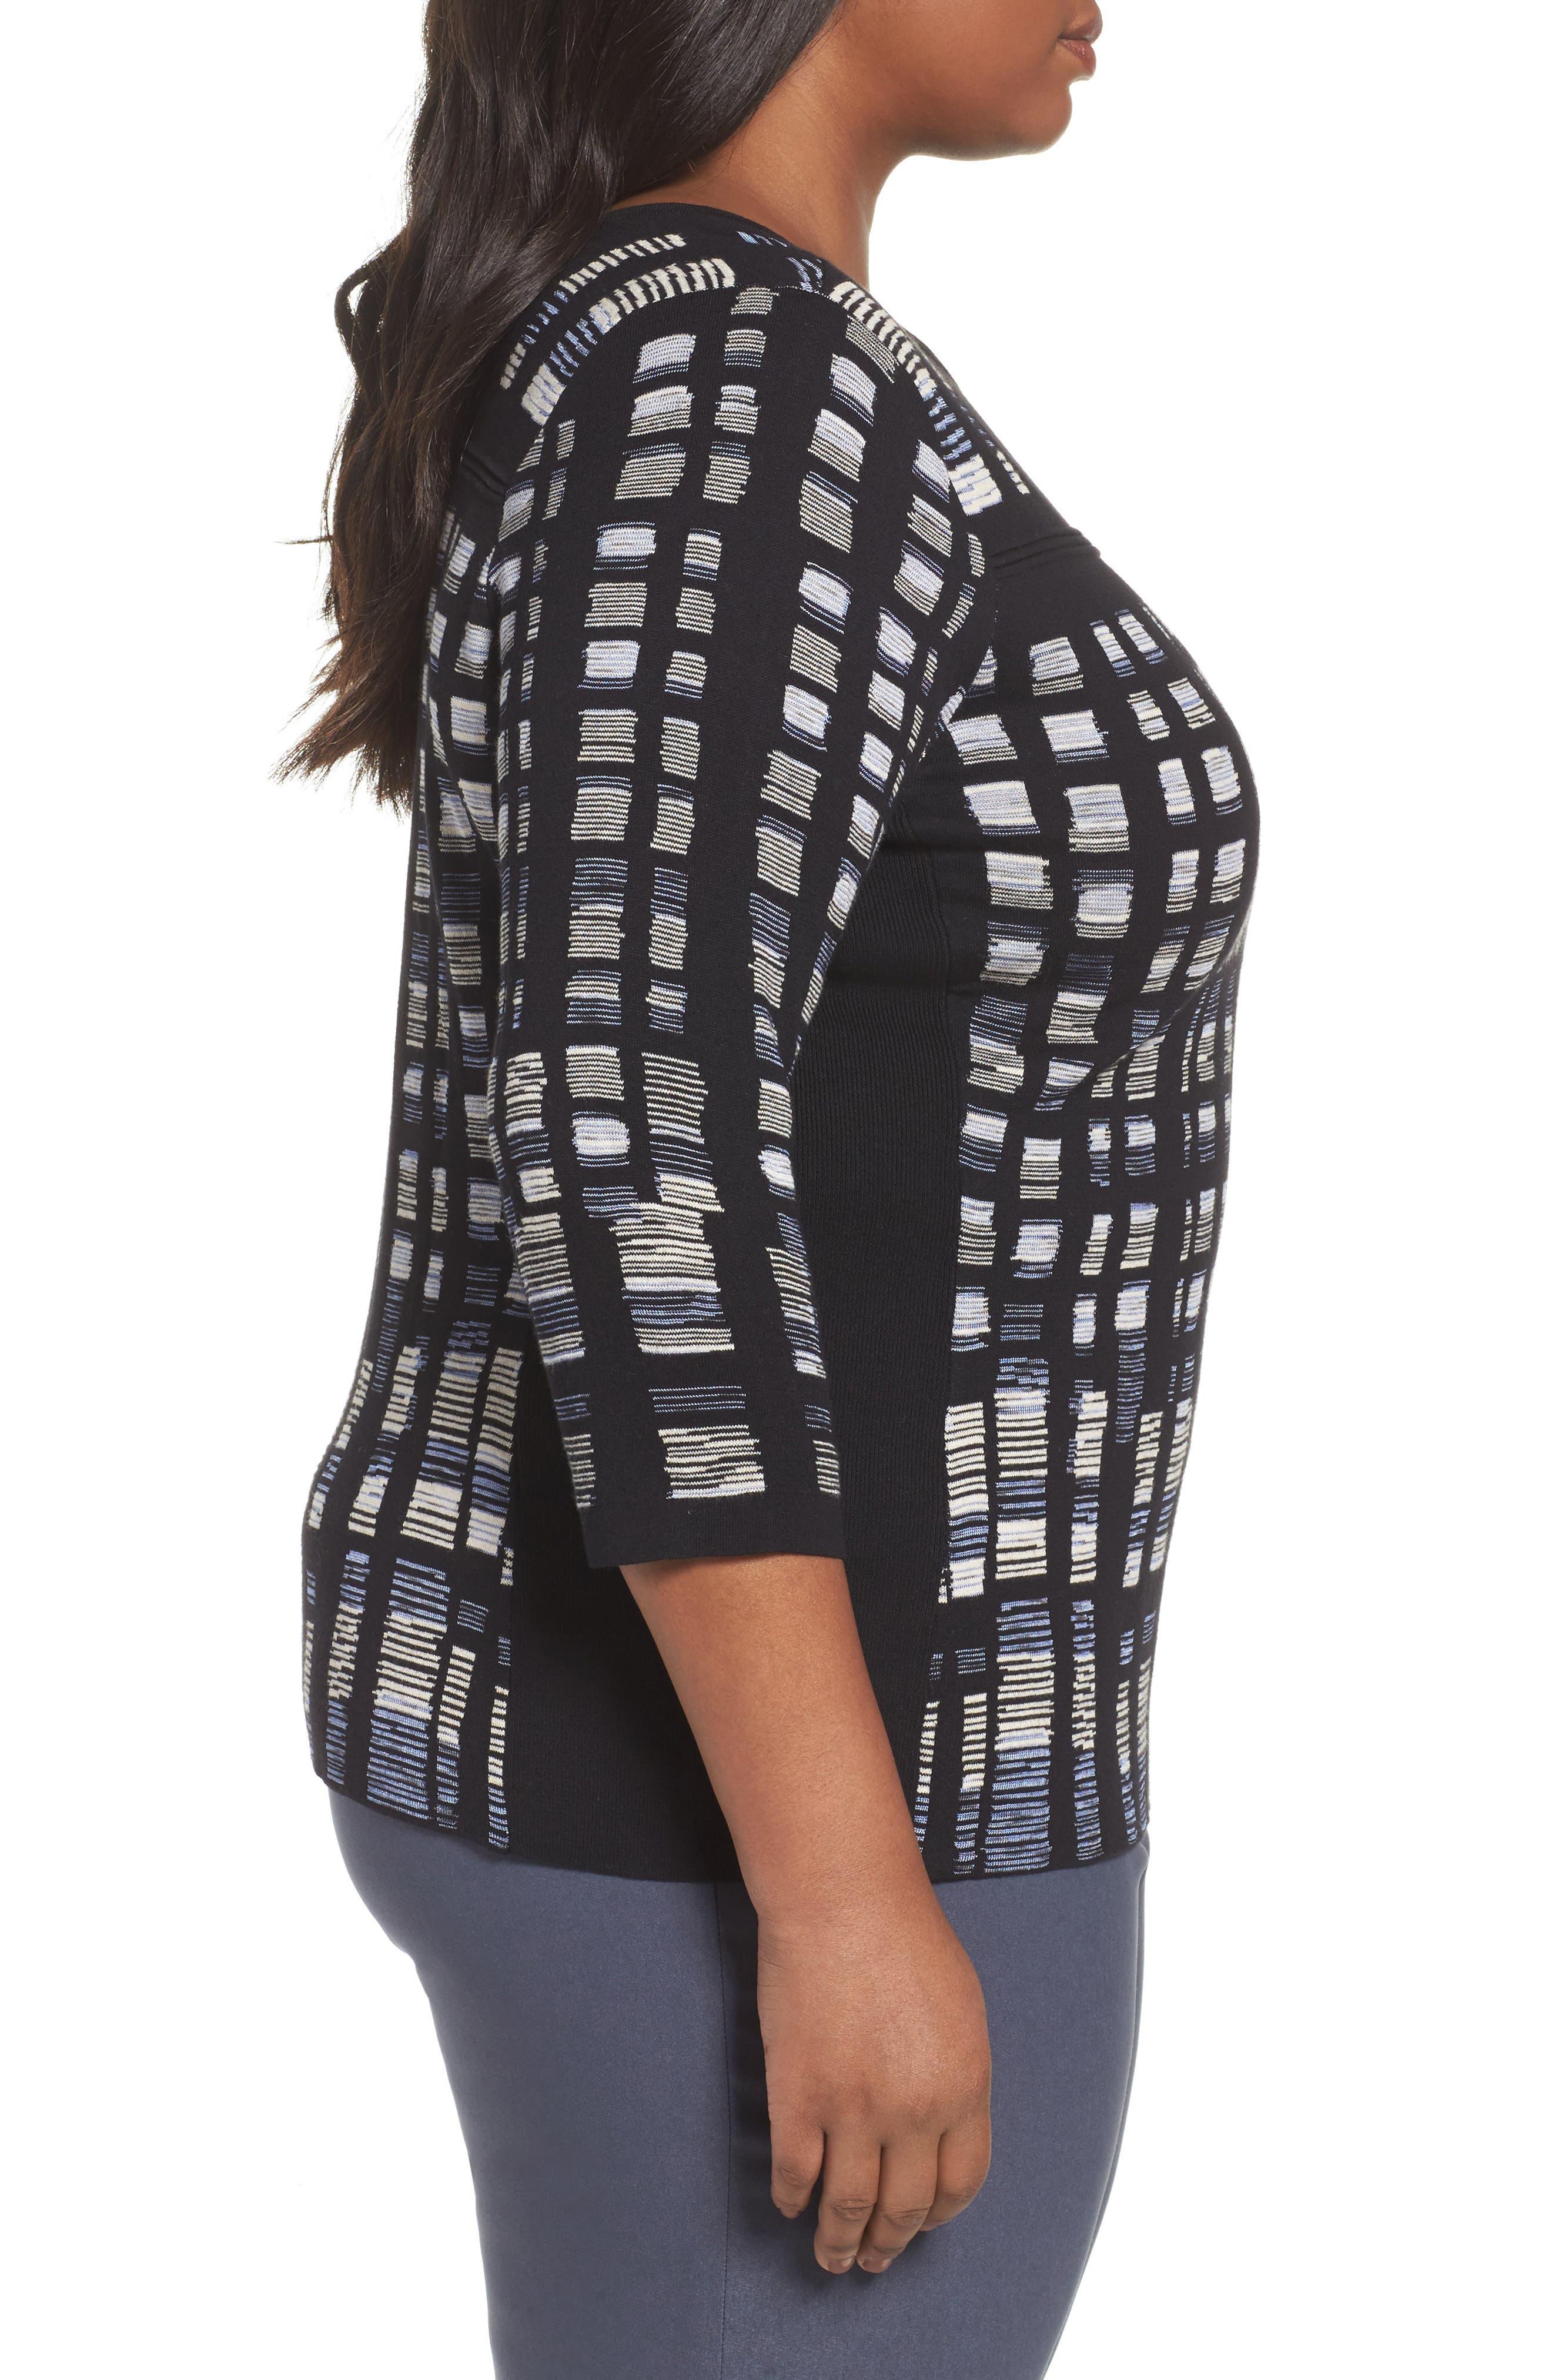 Crystal Cove Sweater,                             Alternate thumbnail 3, color,                             BLACK MULTI